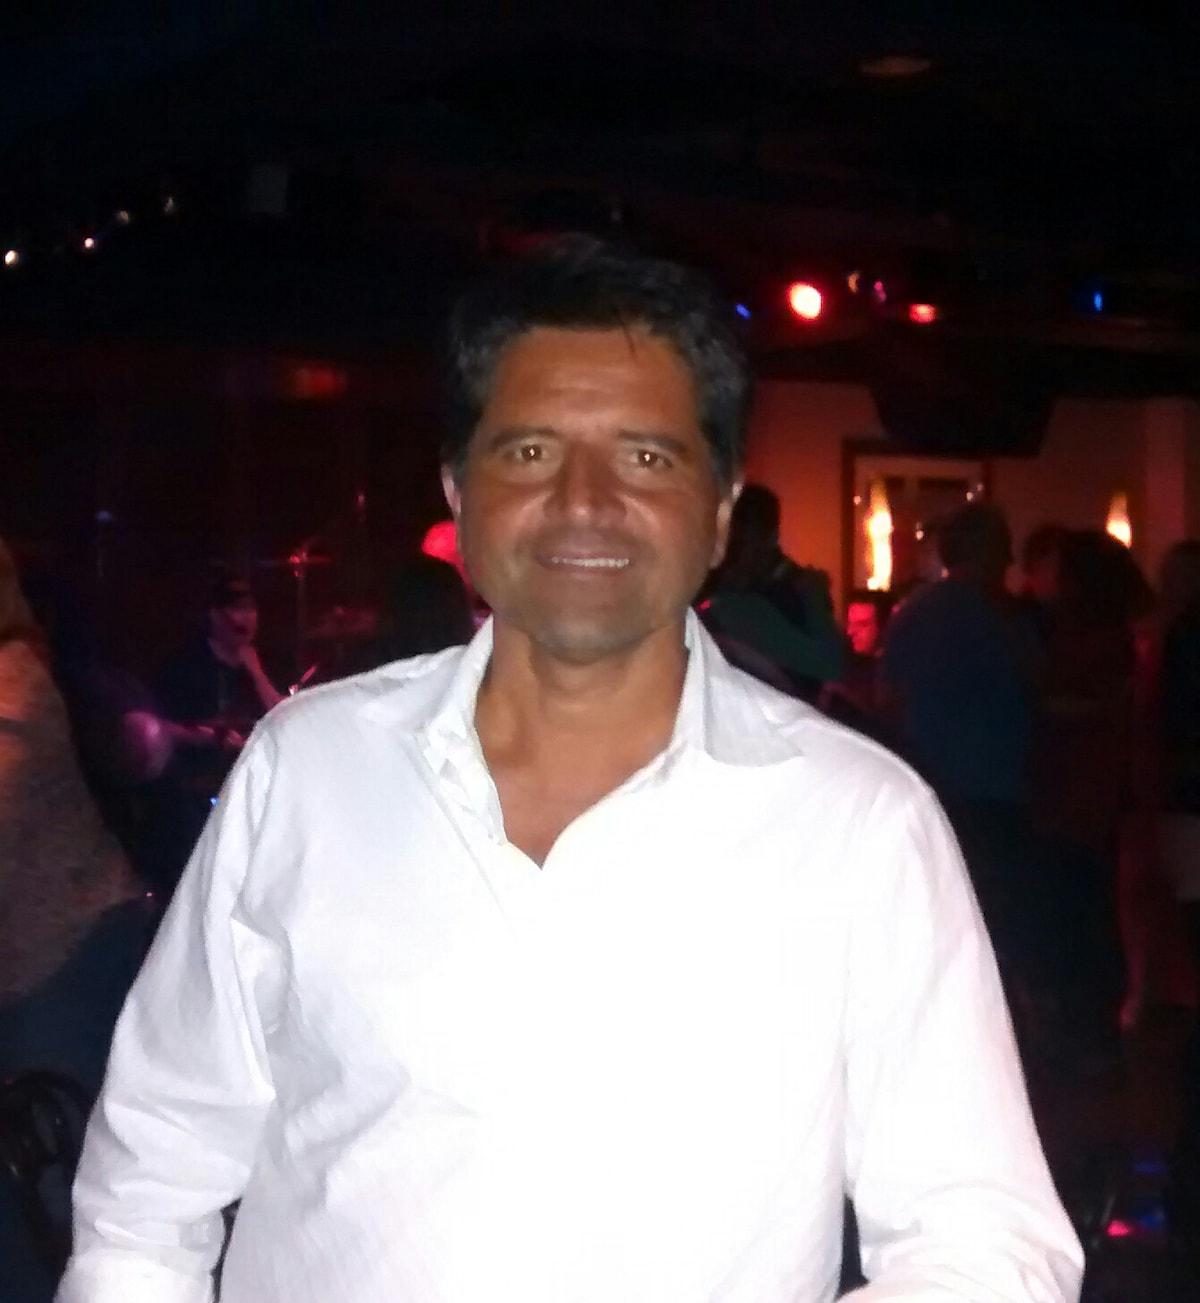 Daniel from Atenas